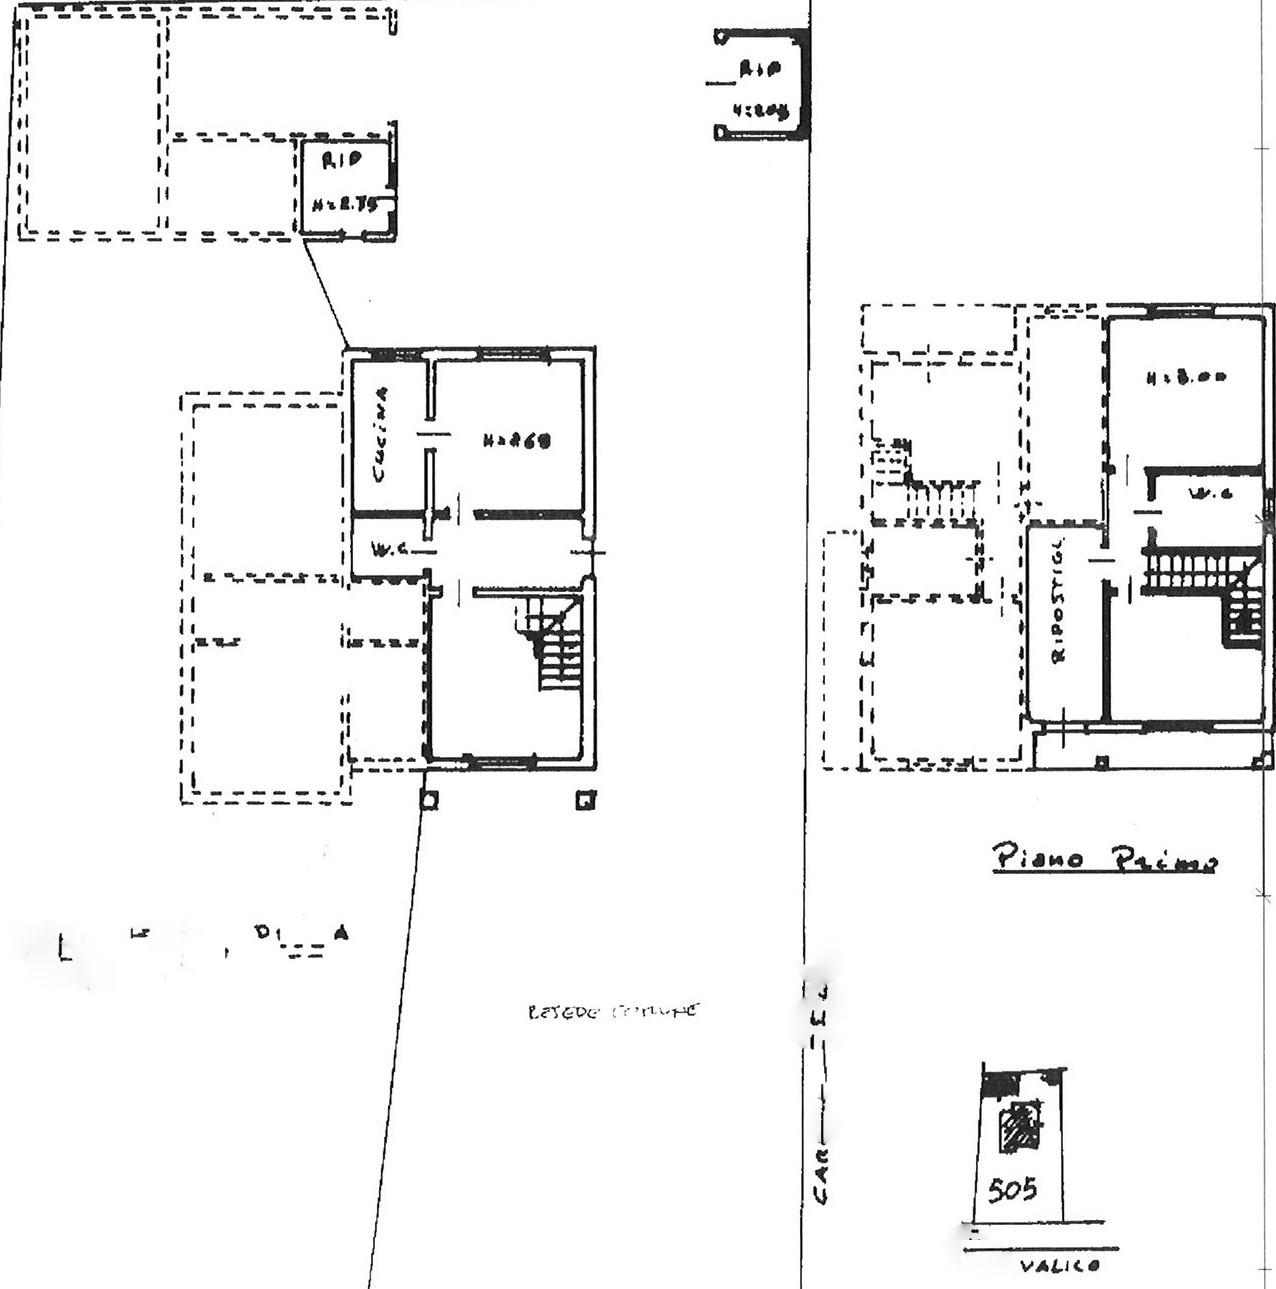 Planimetria 1/1 per rif. vbf altop 165